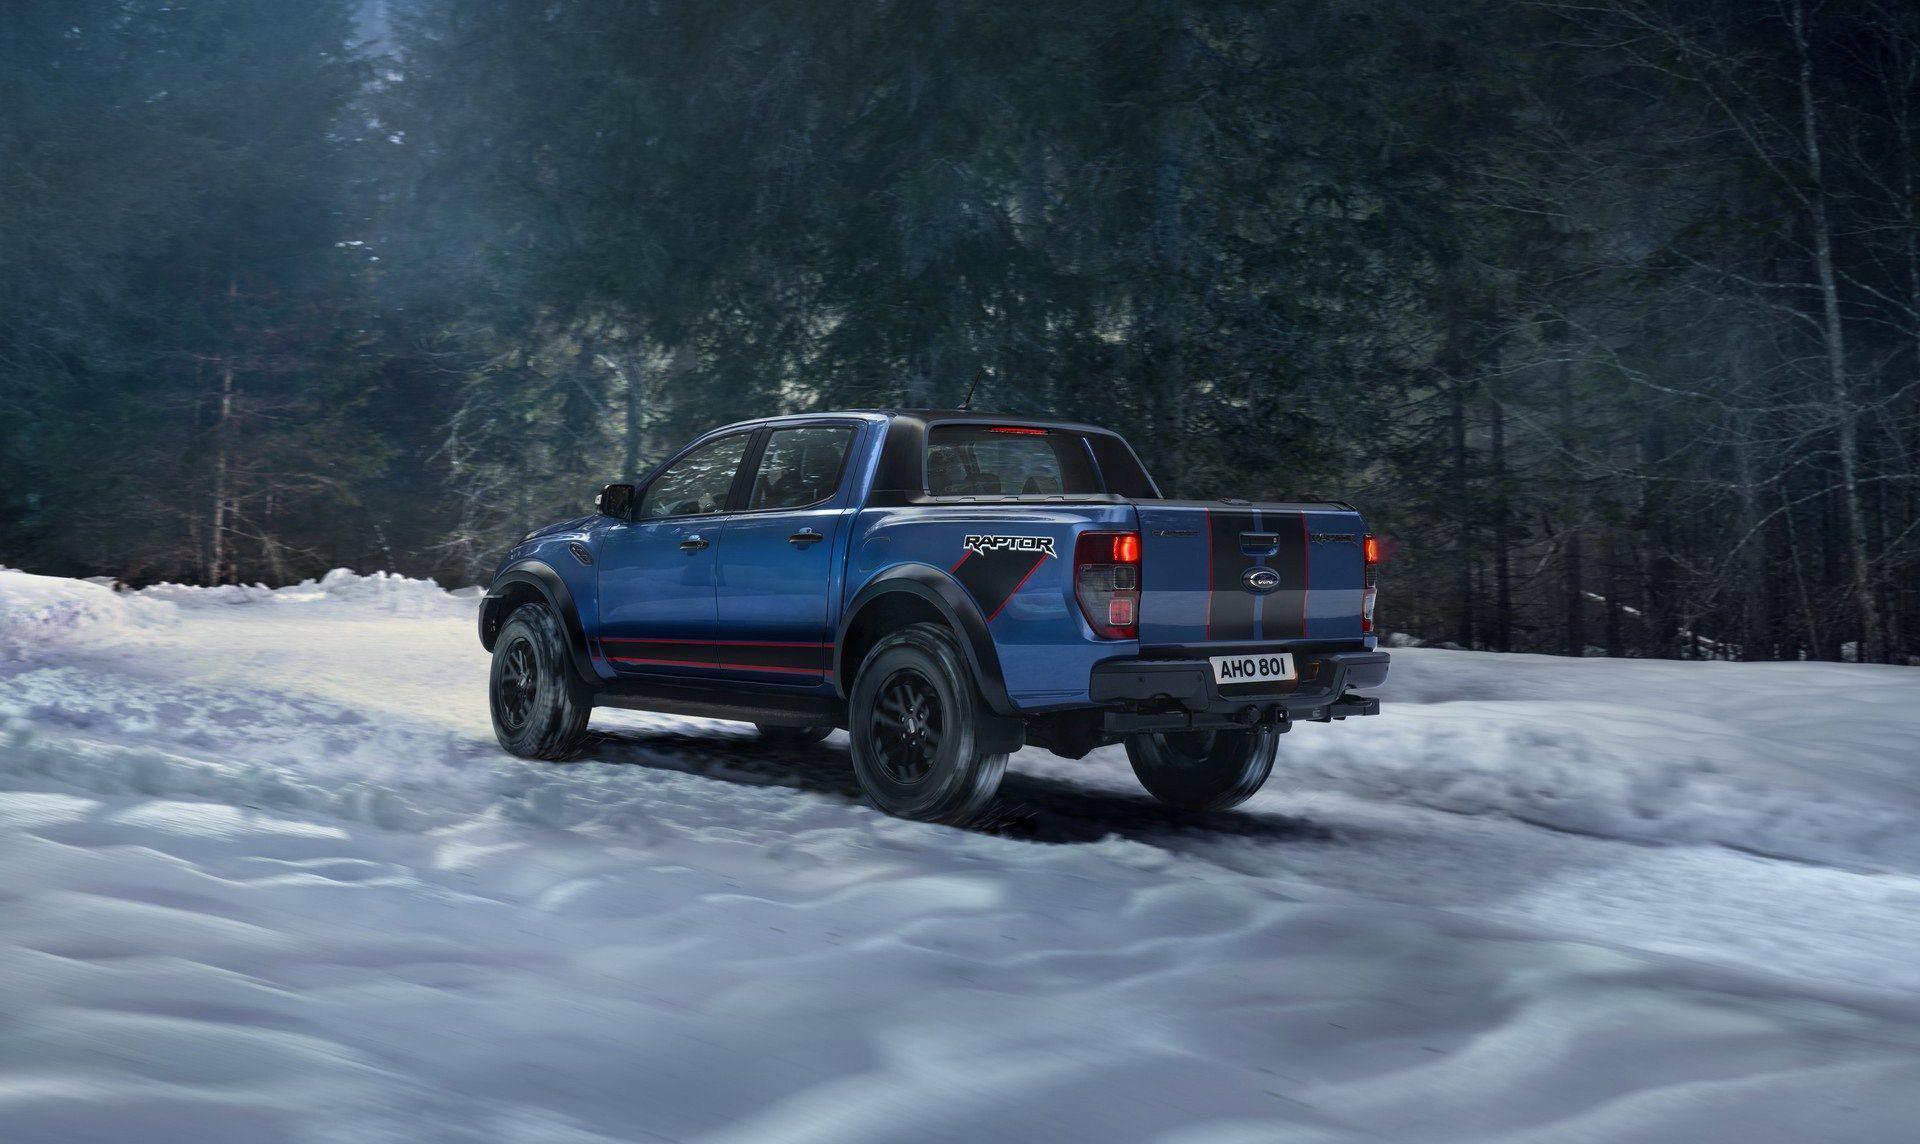 Ford_Ranger_Raptor_Special_Edition-0007